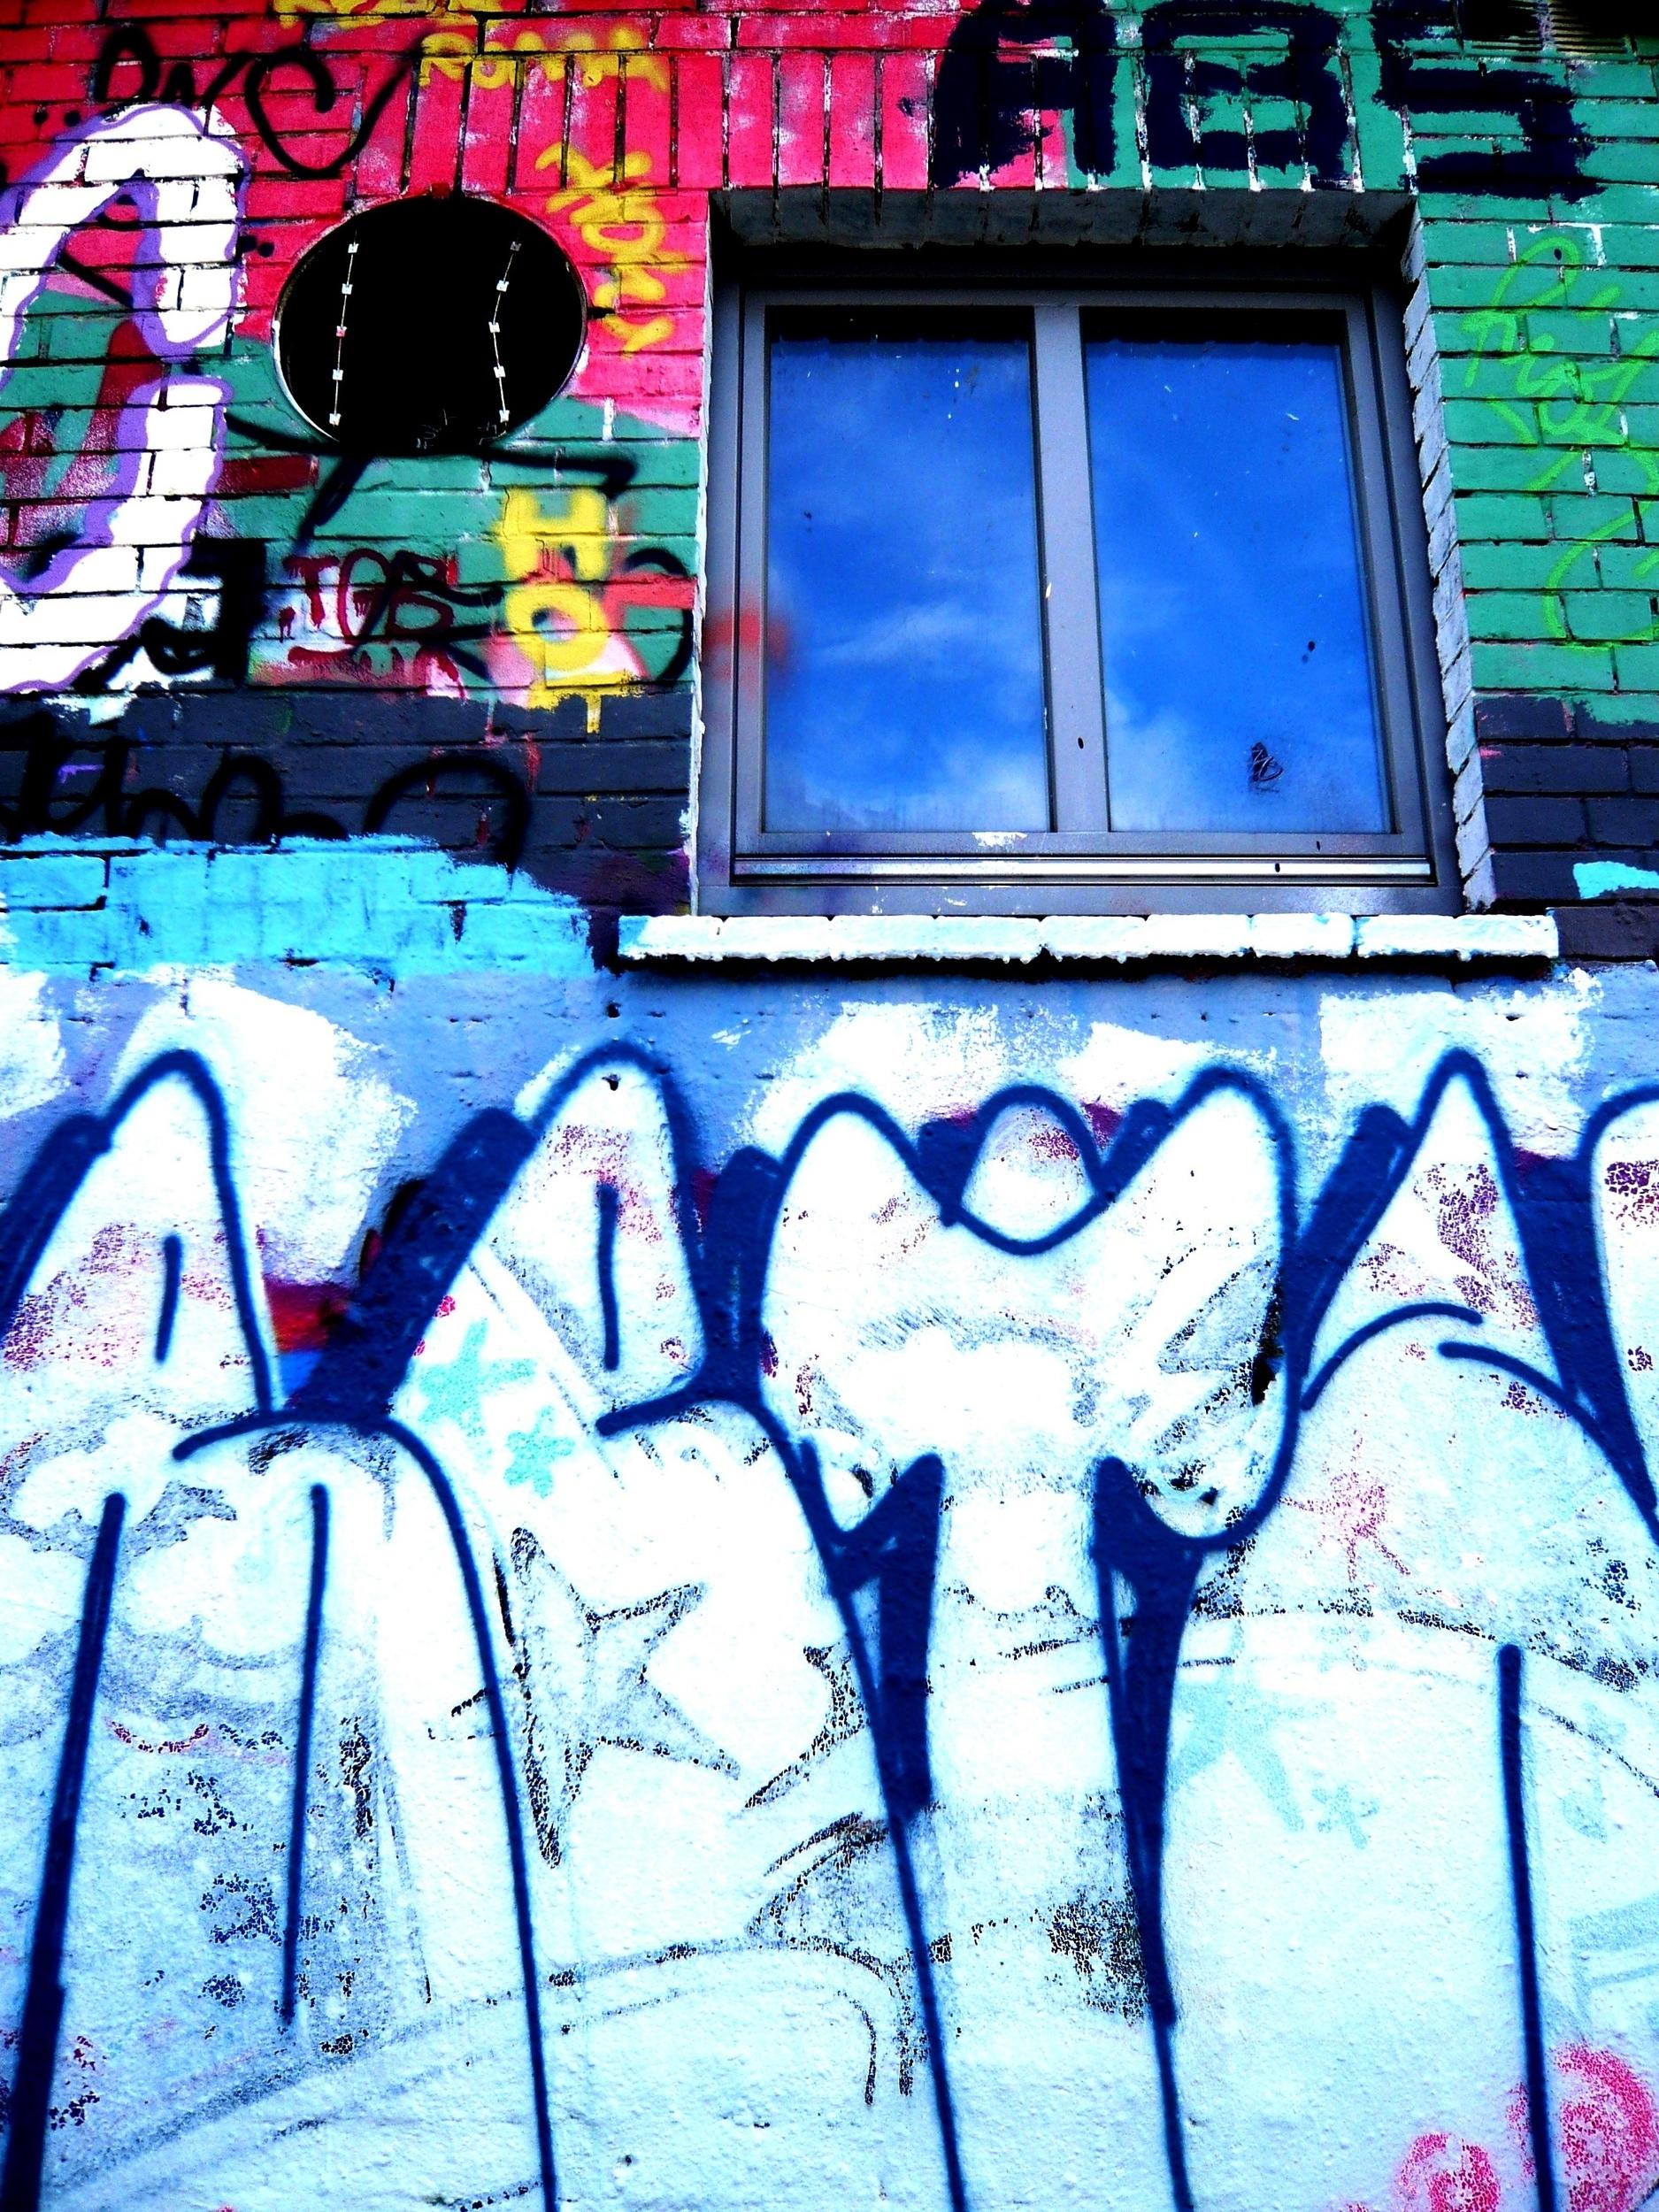 city bty col sk kayss (29).JPG